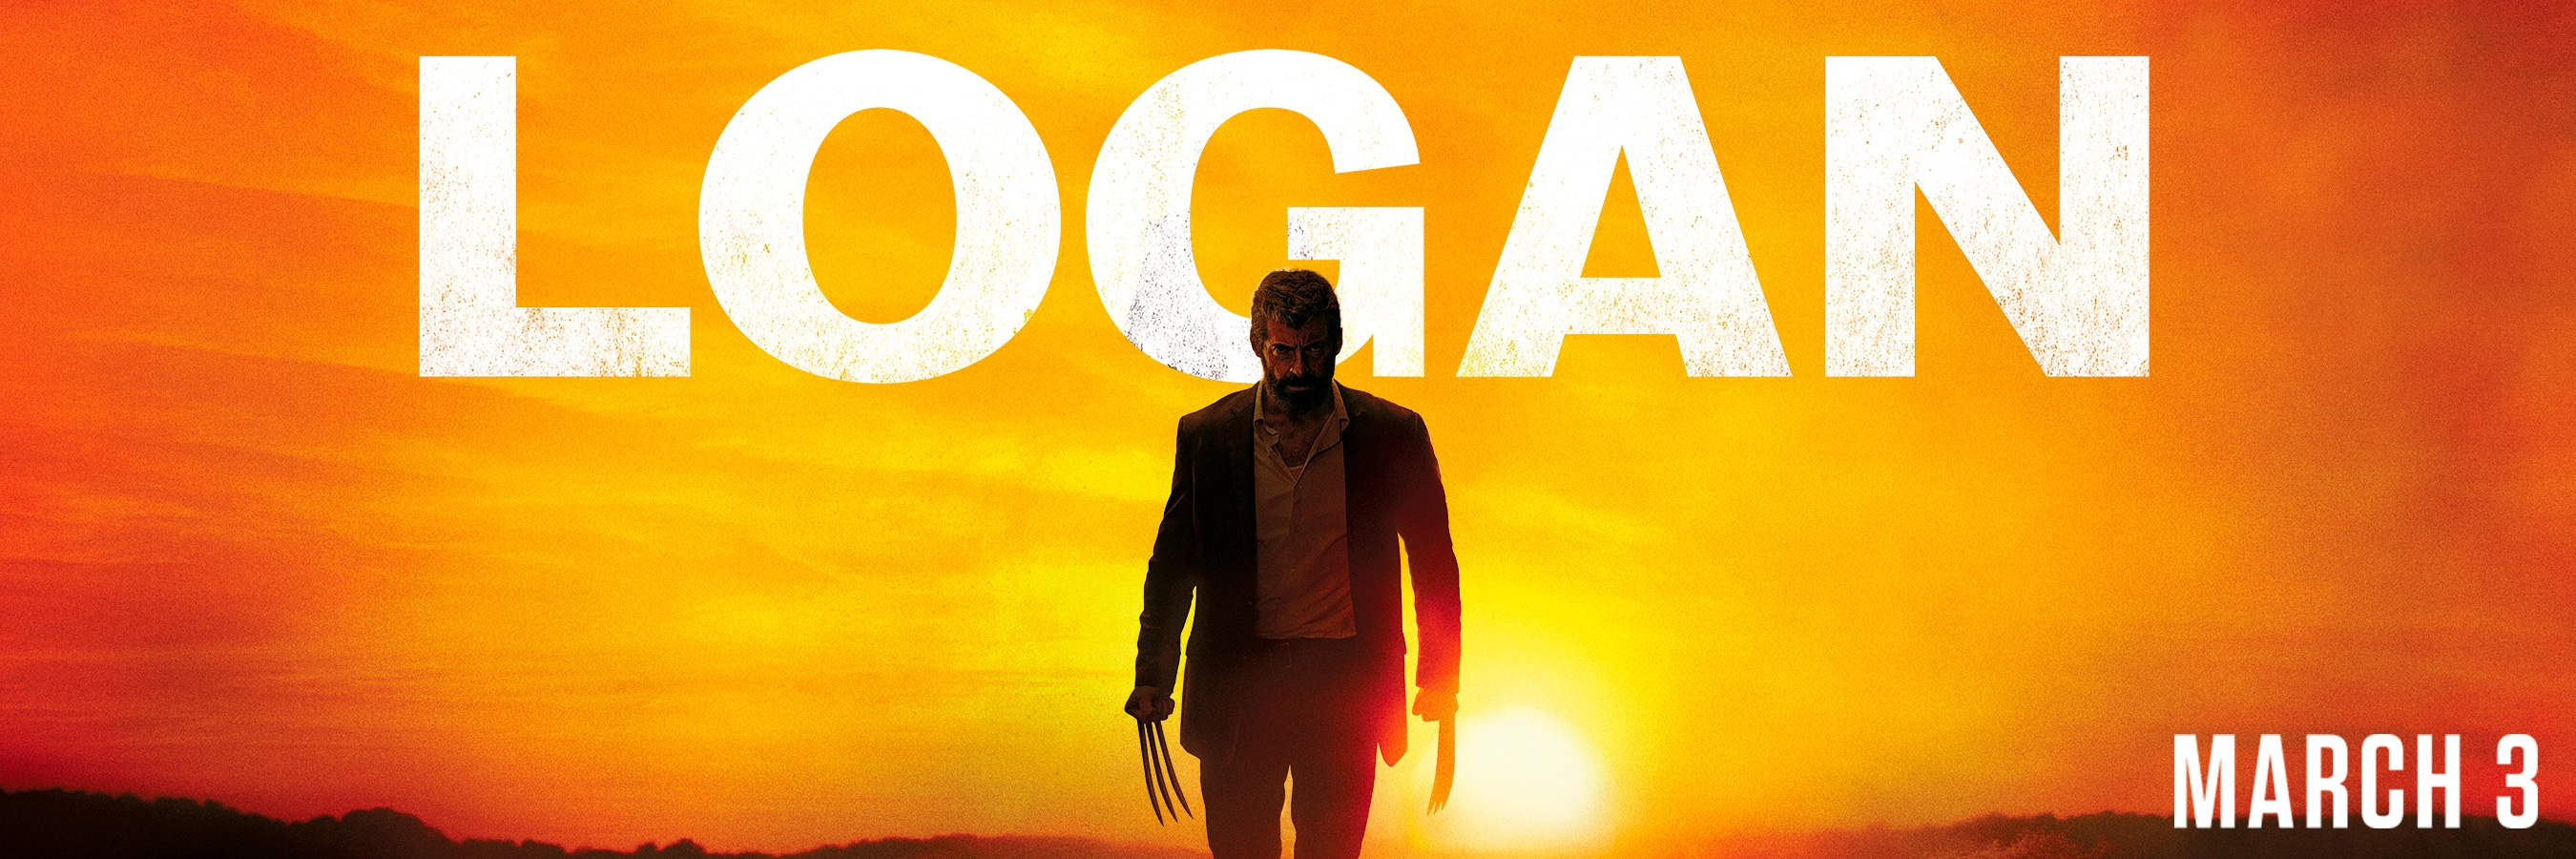 'Logan' Super Bowl Trailer Delivers with Grace